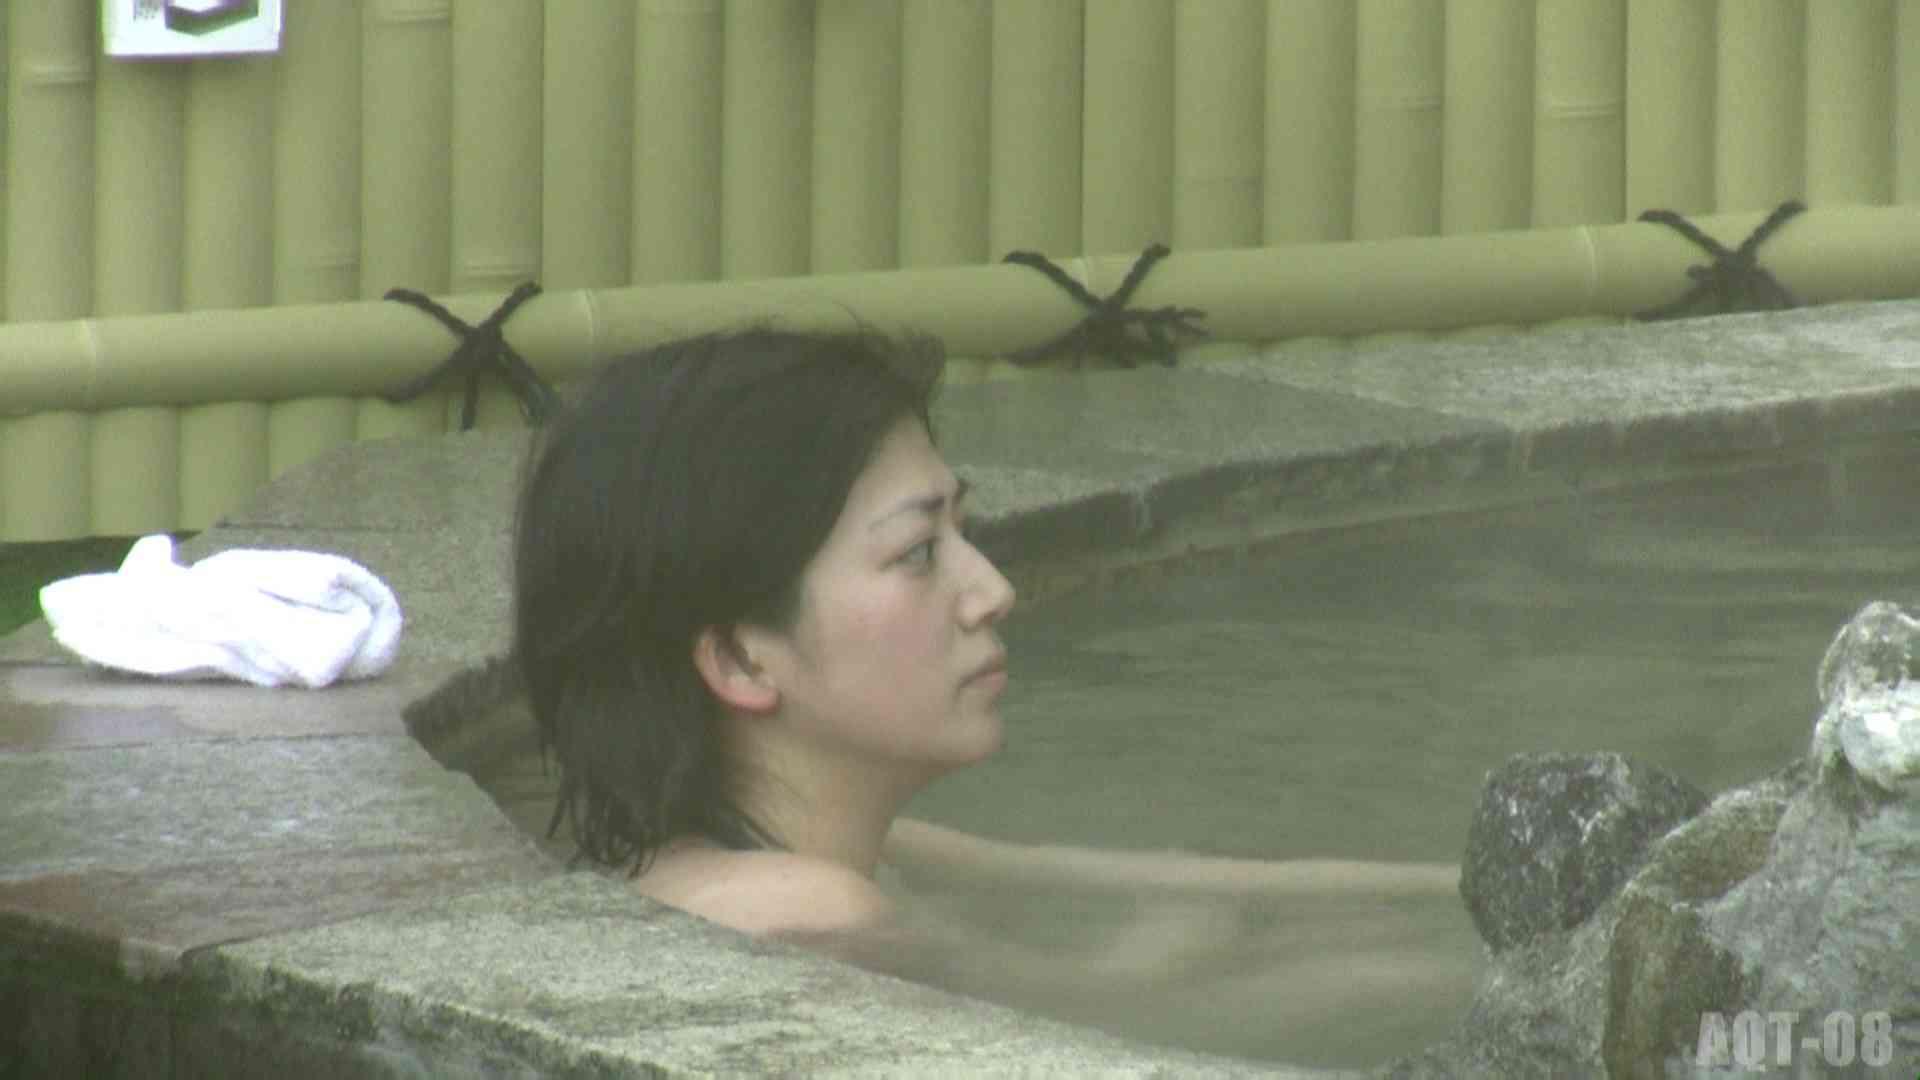 Aquaな露天風呂Vol.776 露天 | OLセックス  108画像 97